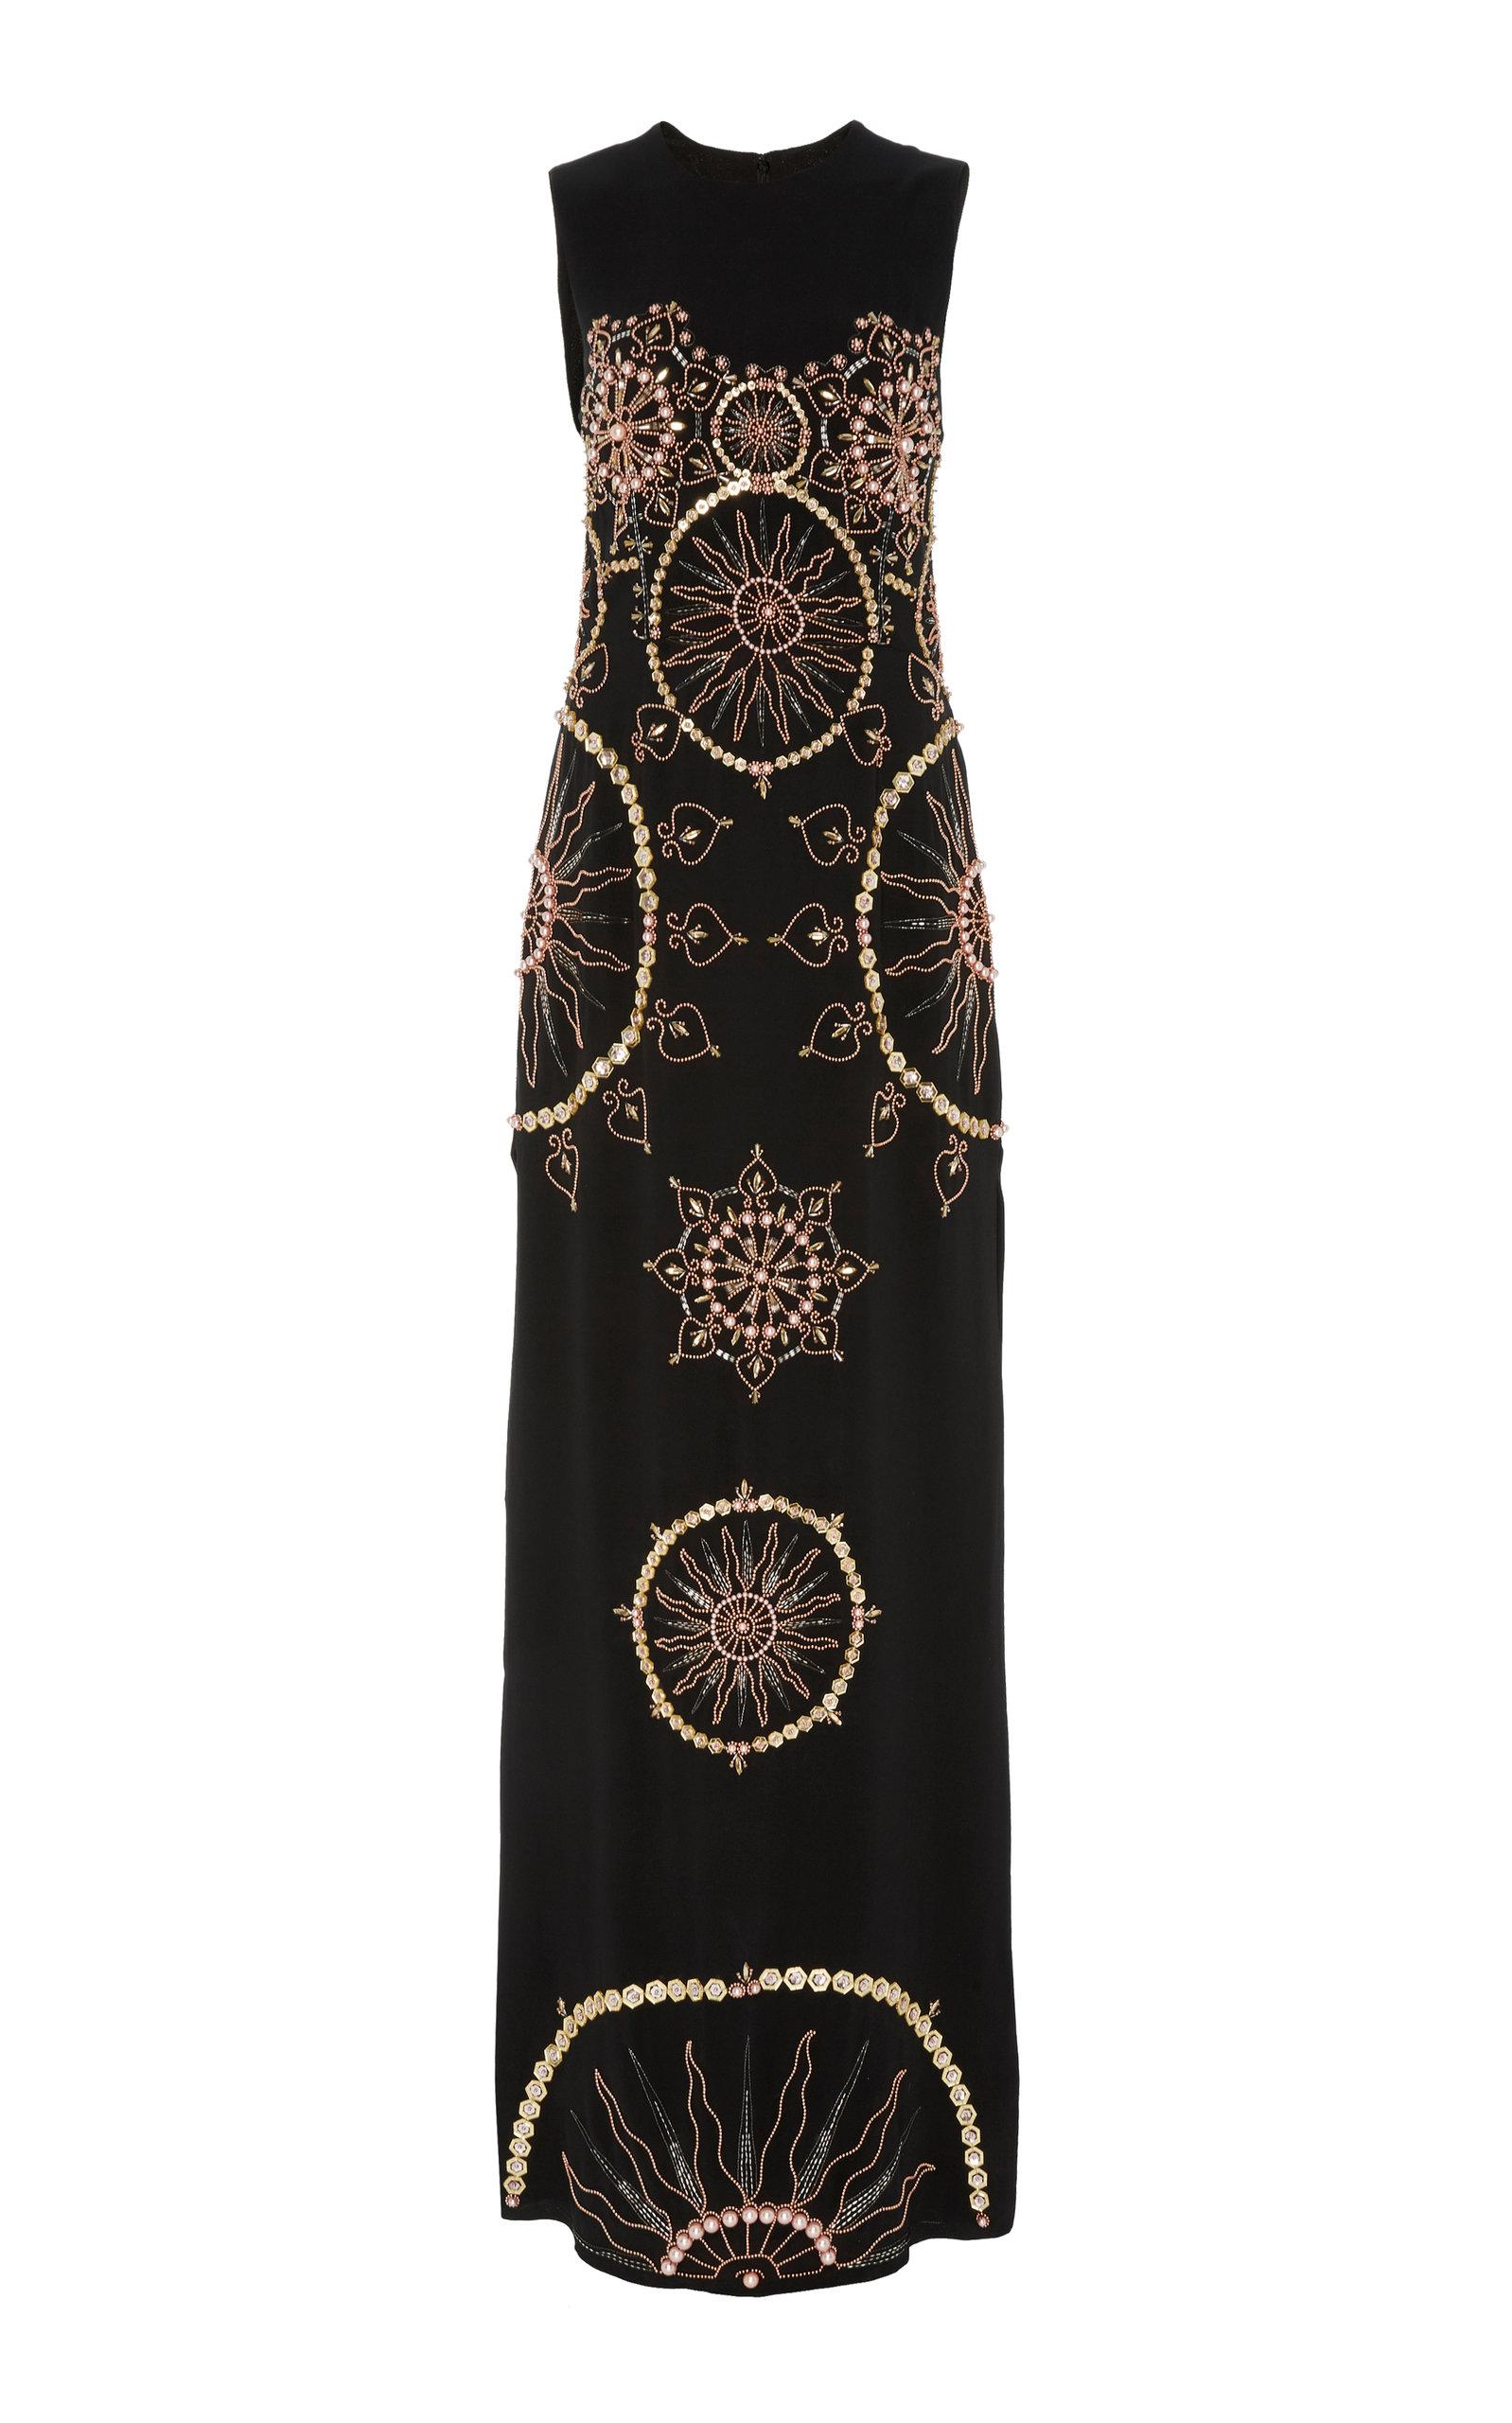 CUCCULELLI SHAHEEN Sol Invictus Heavy Silk Georgette Dress in Black